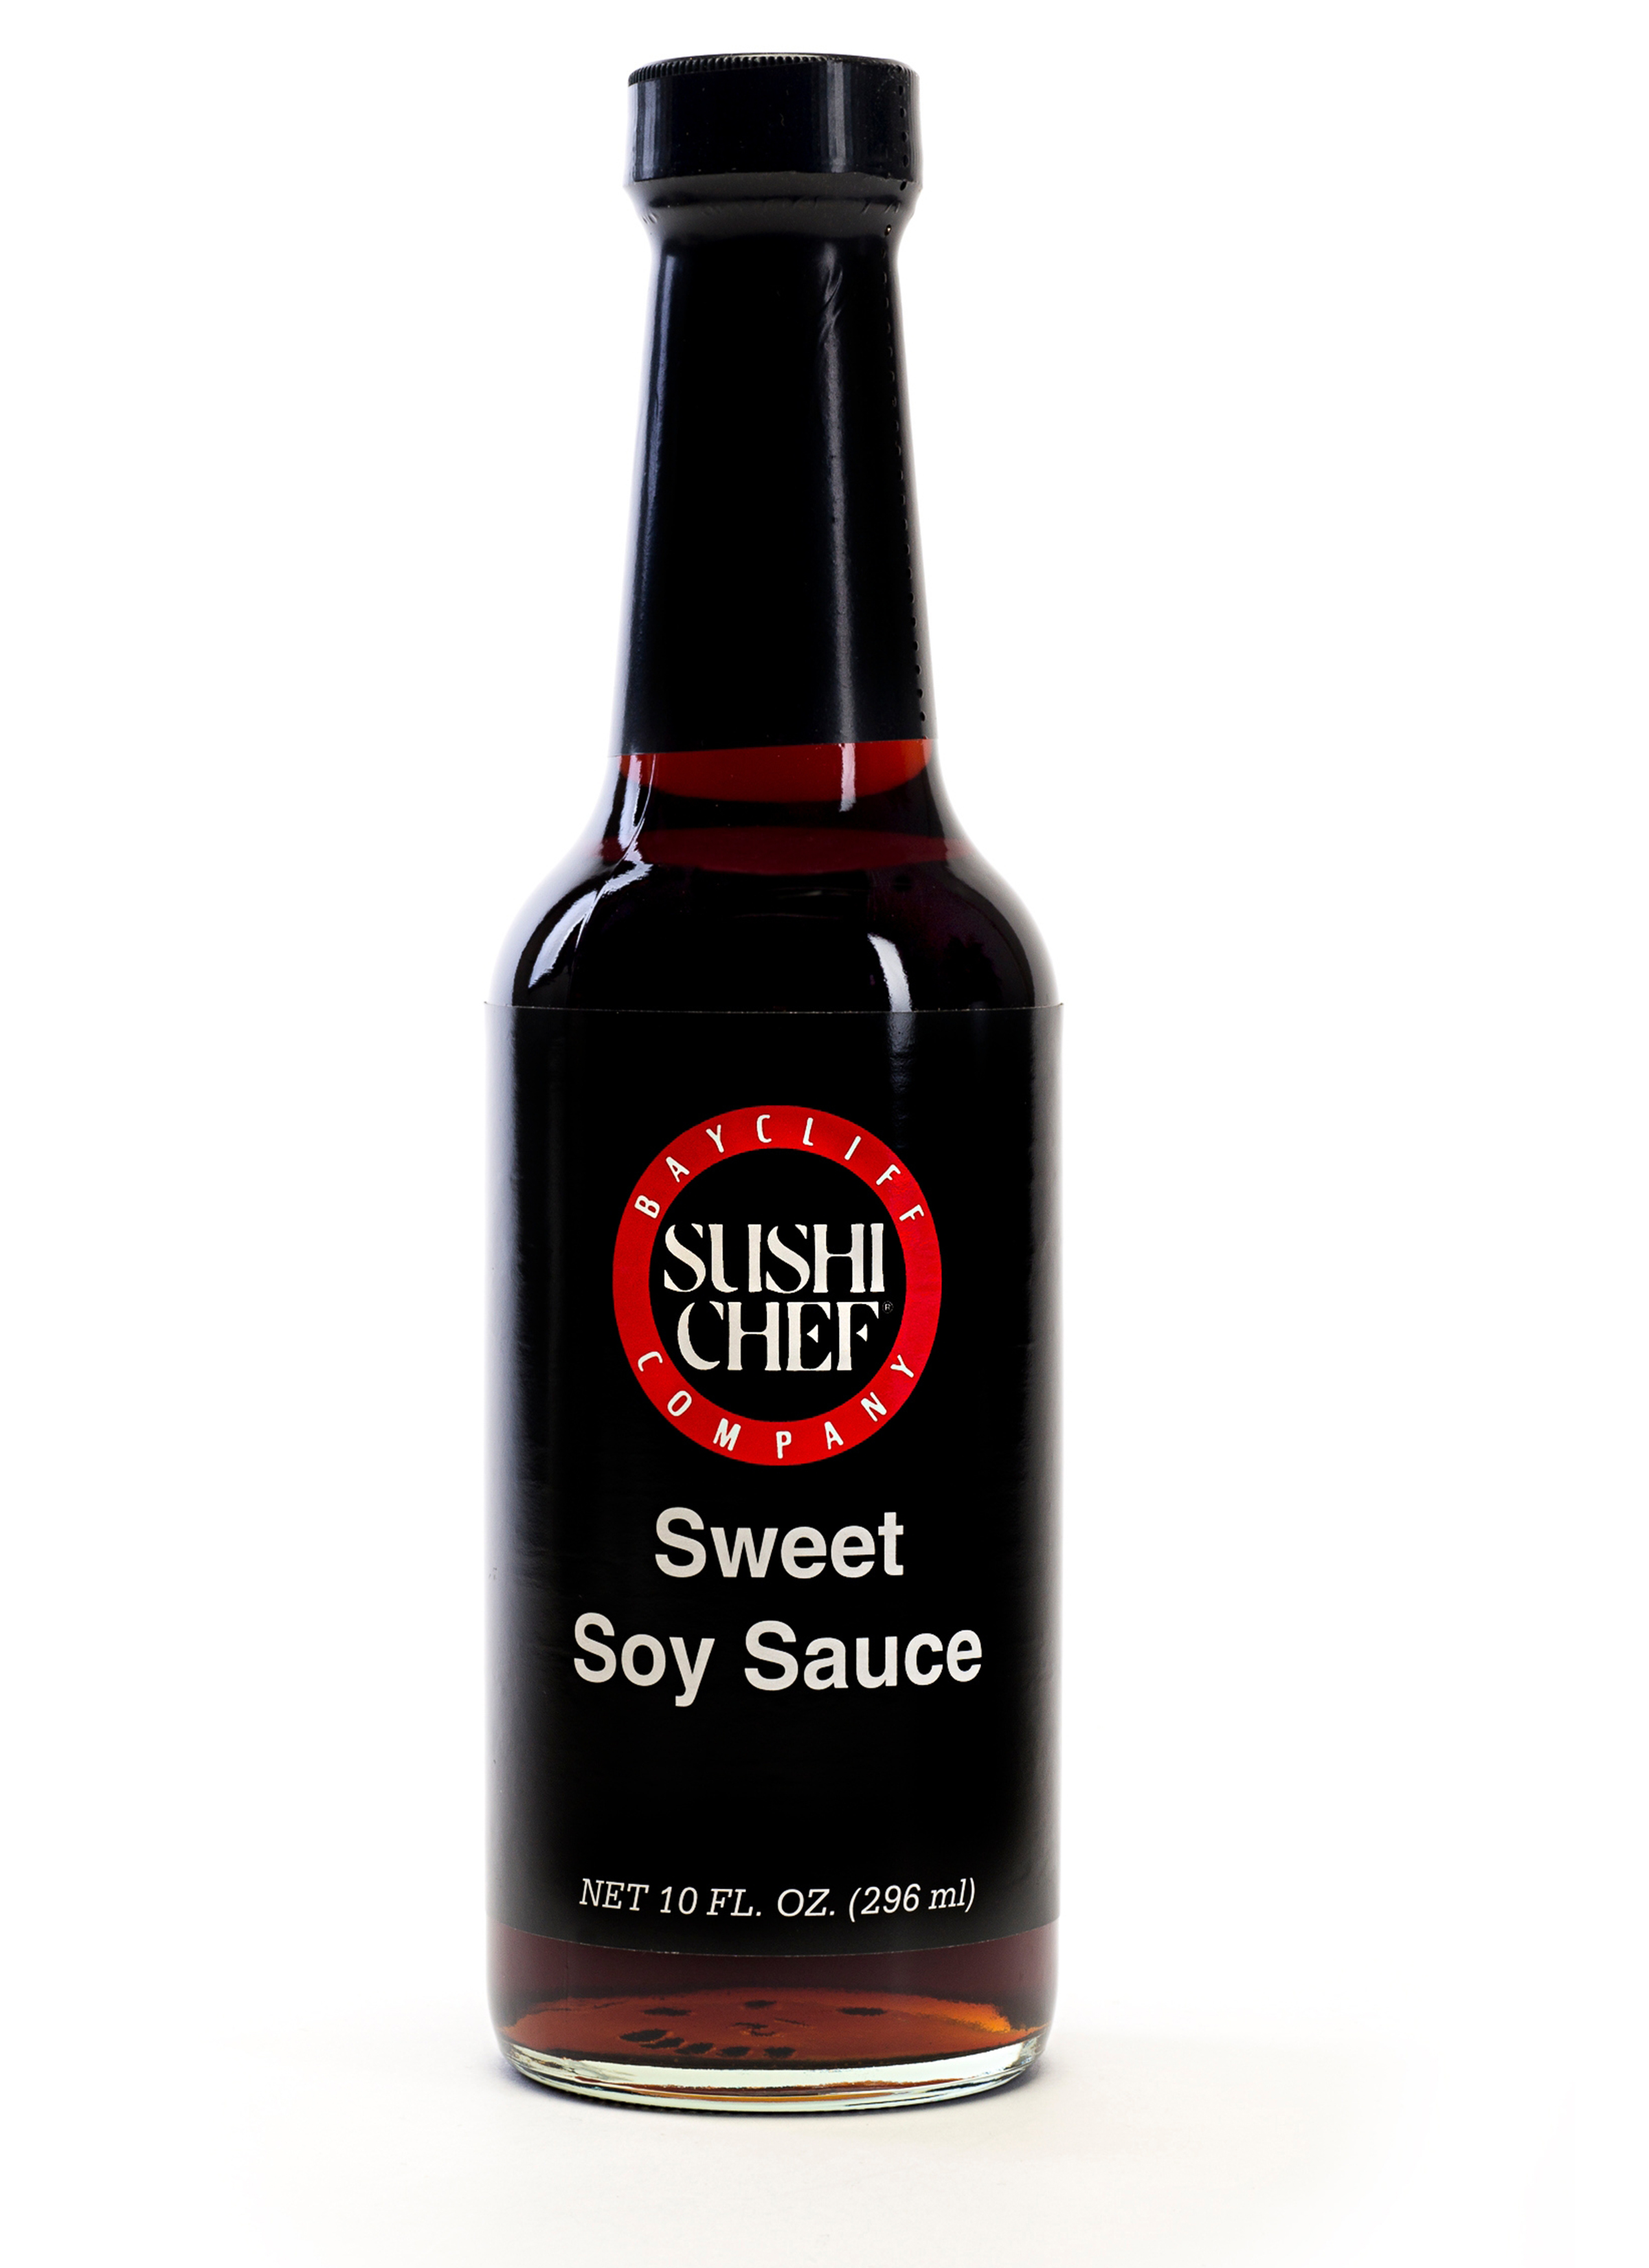 Sweet Soy Sauce